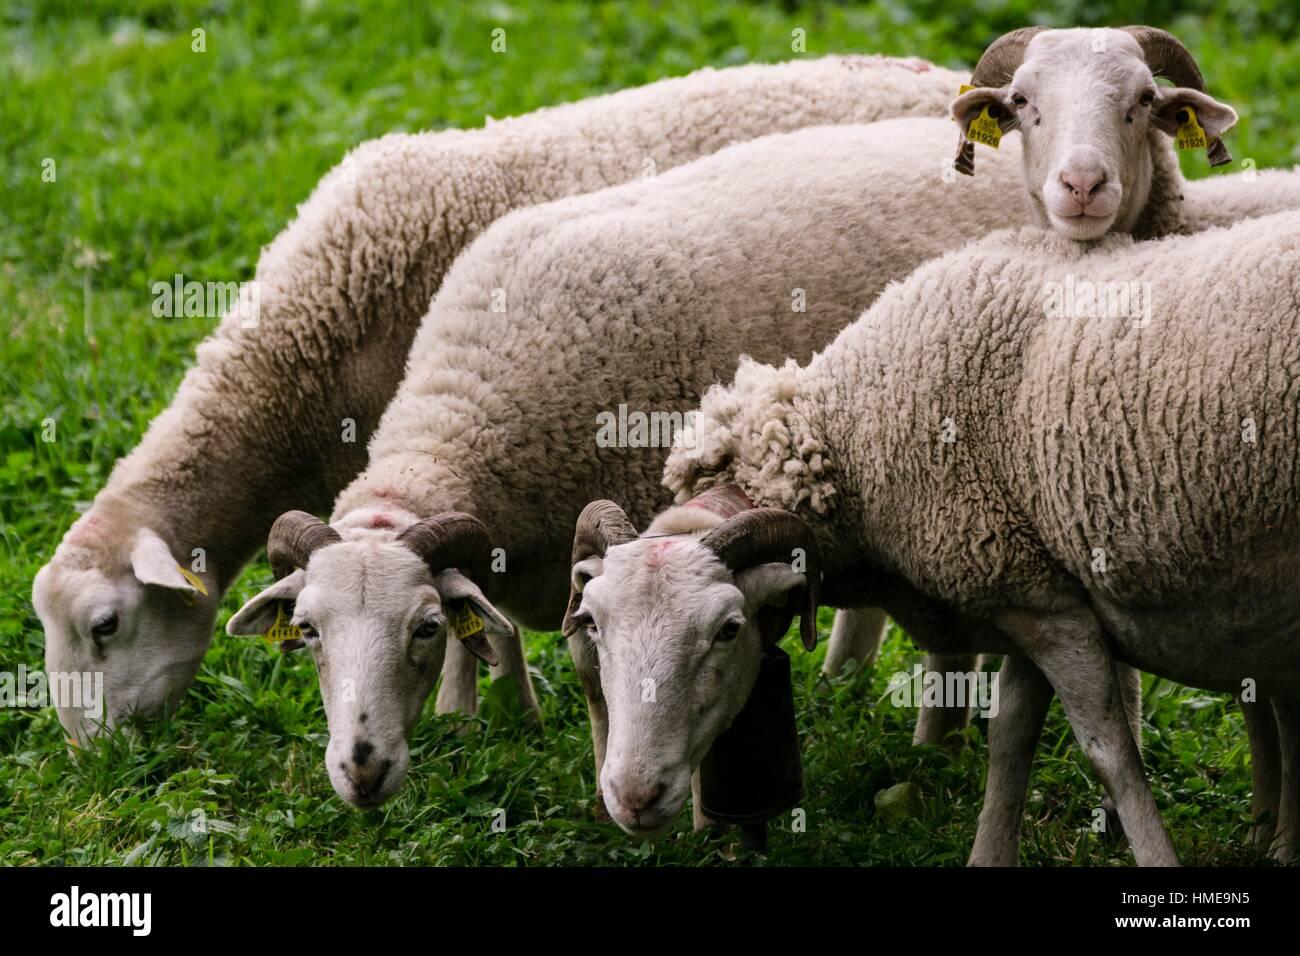 Spain, Pyrenees Mountains, Catalonia, Ribagorza region, Lleida province, Aran Valley, Bausen, Four Aranese sheep - Stock Image